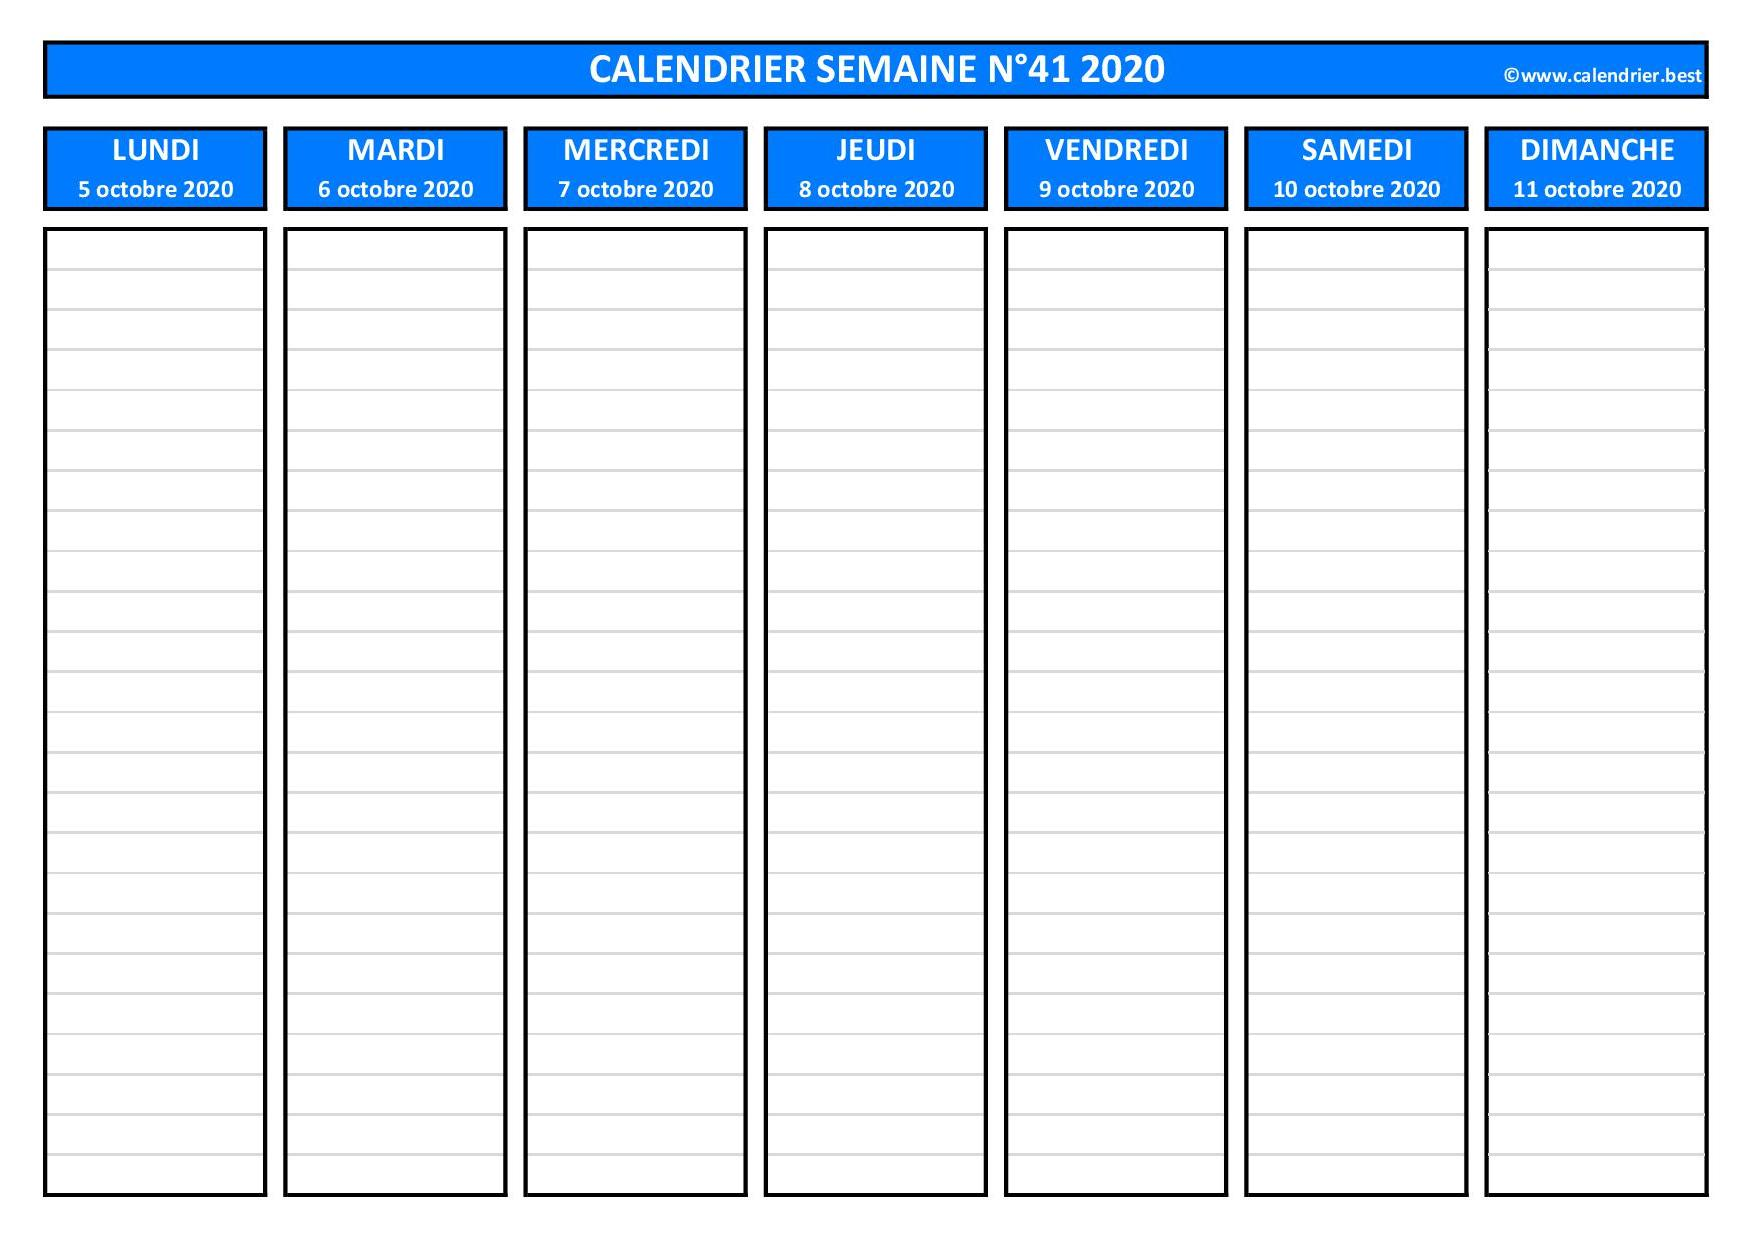 Semaine 41 2020 : dates, calendrier et planning  Calendrier.best